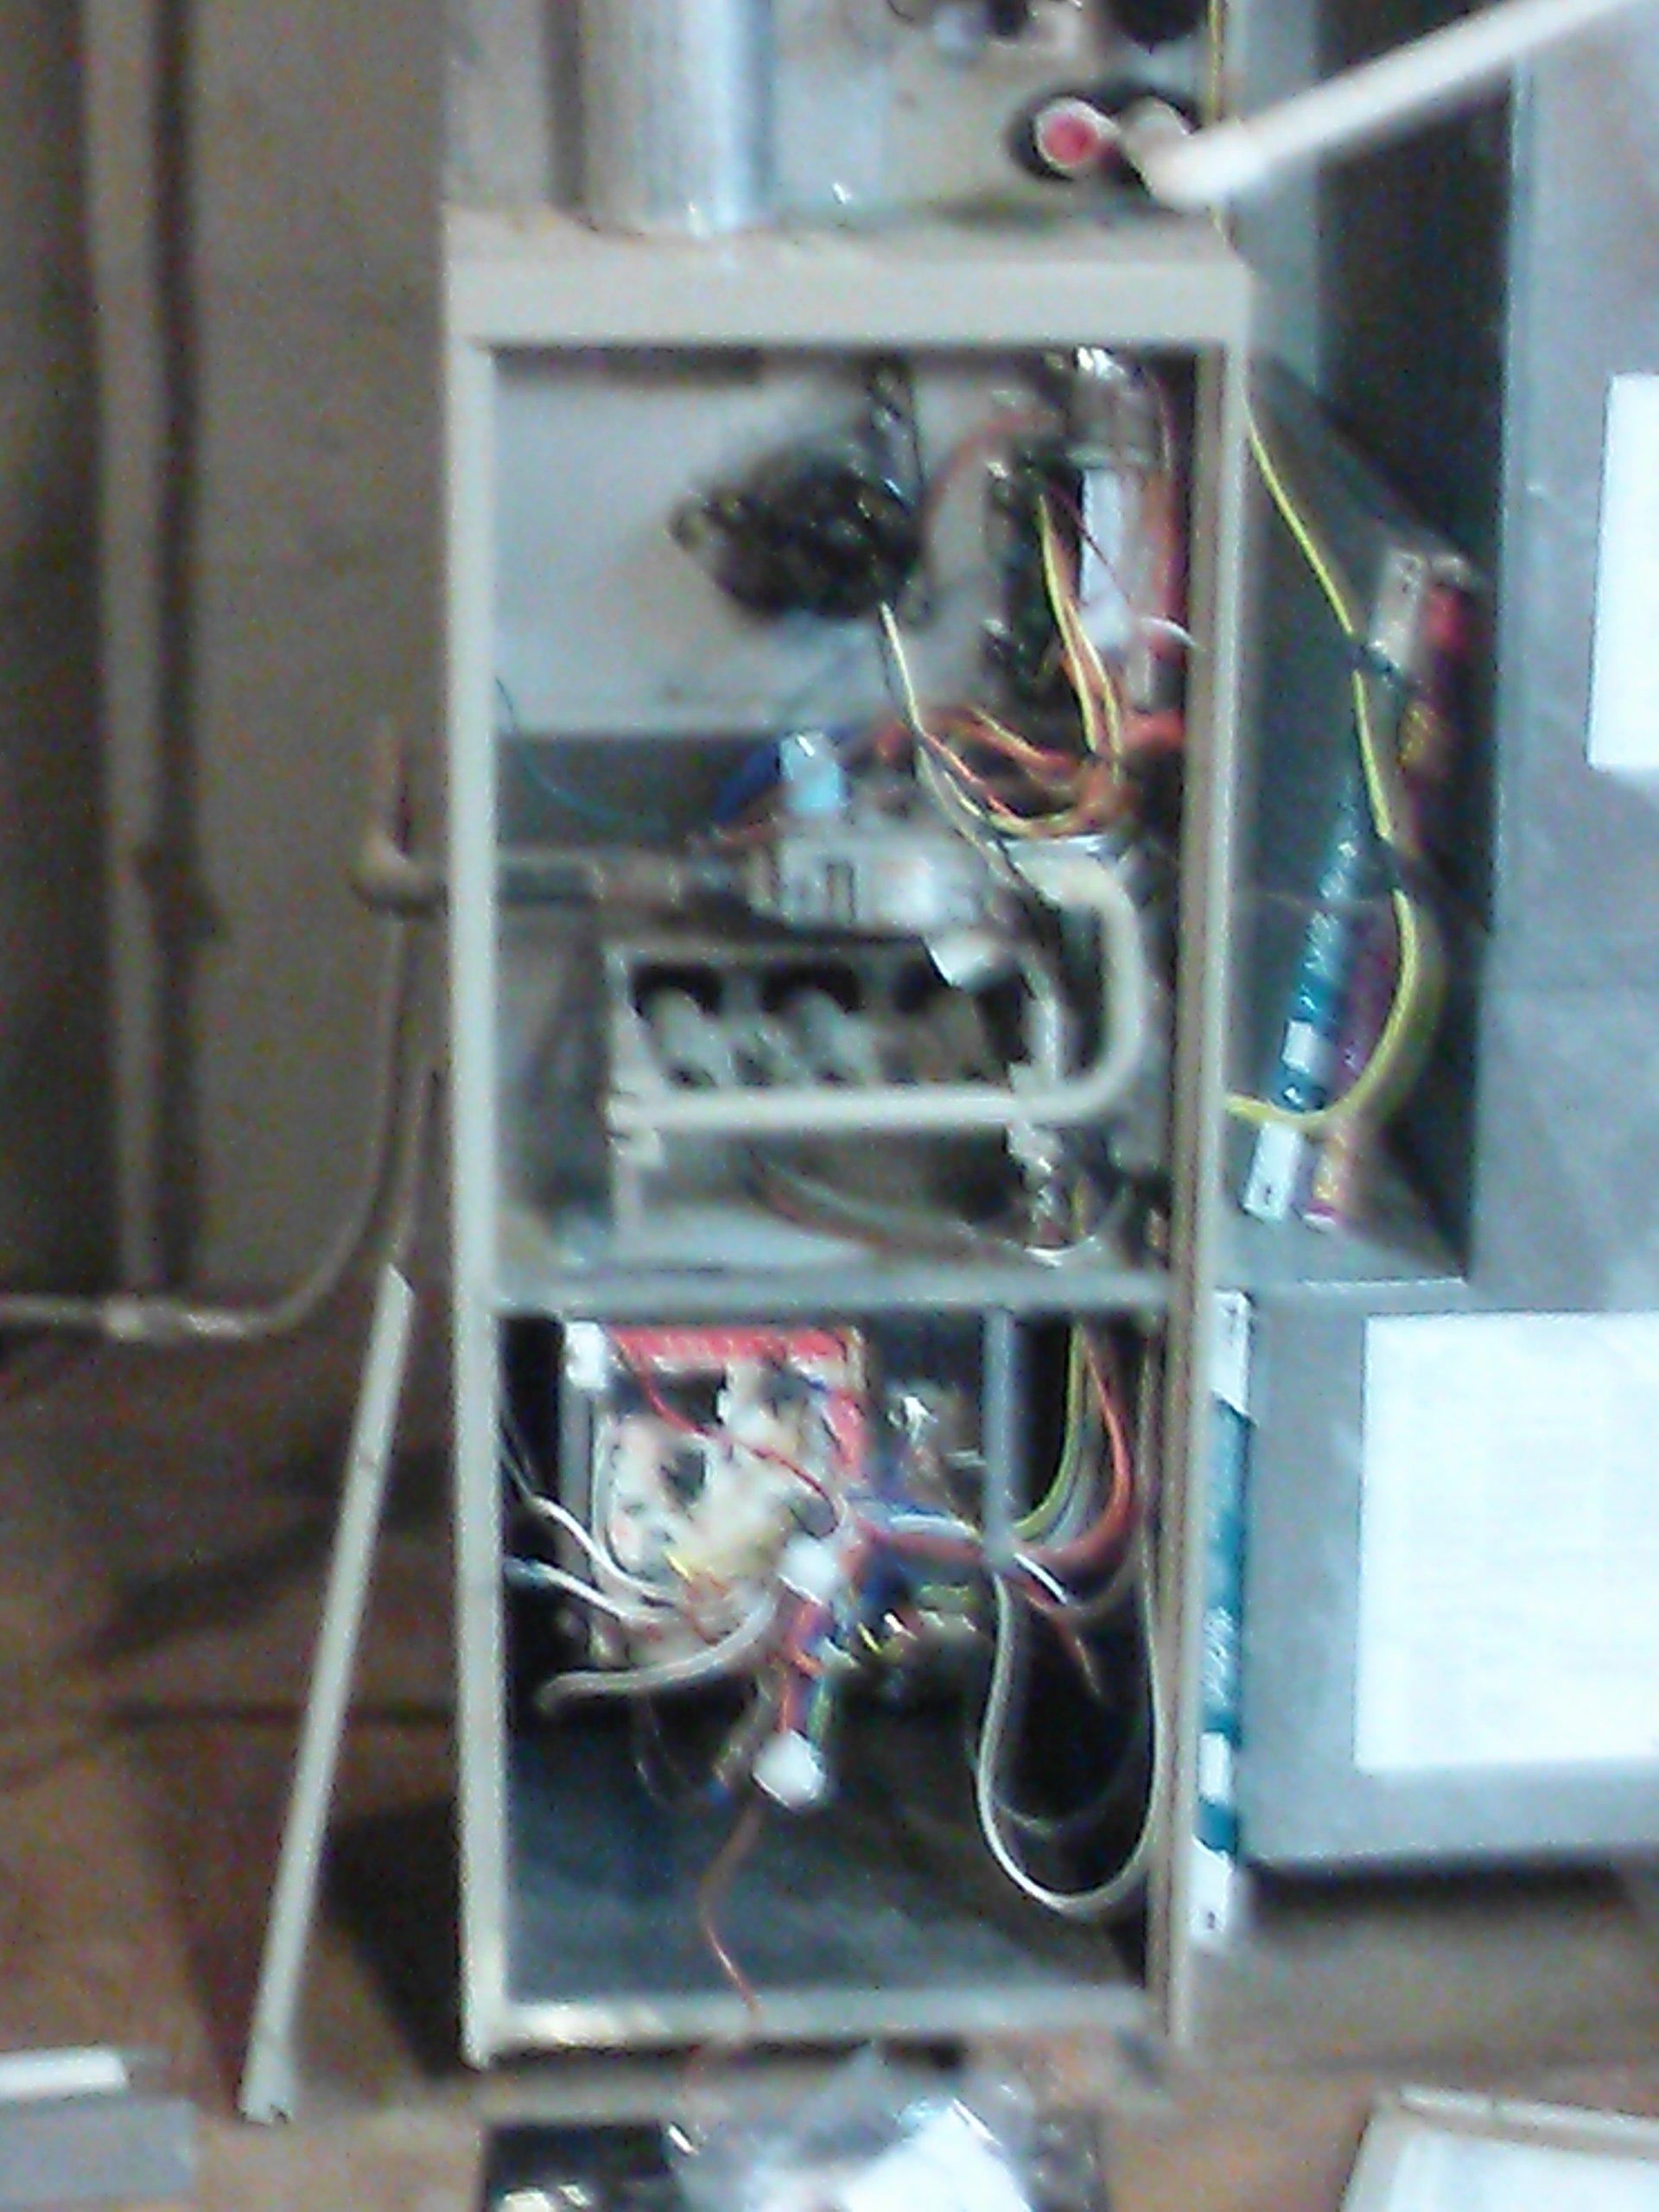 Attic Fan With Thermostat Wiring Diagram The Life Of Garrett F Blog Of Garrett F Page 11